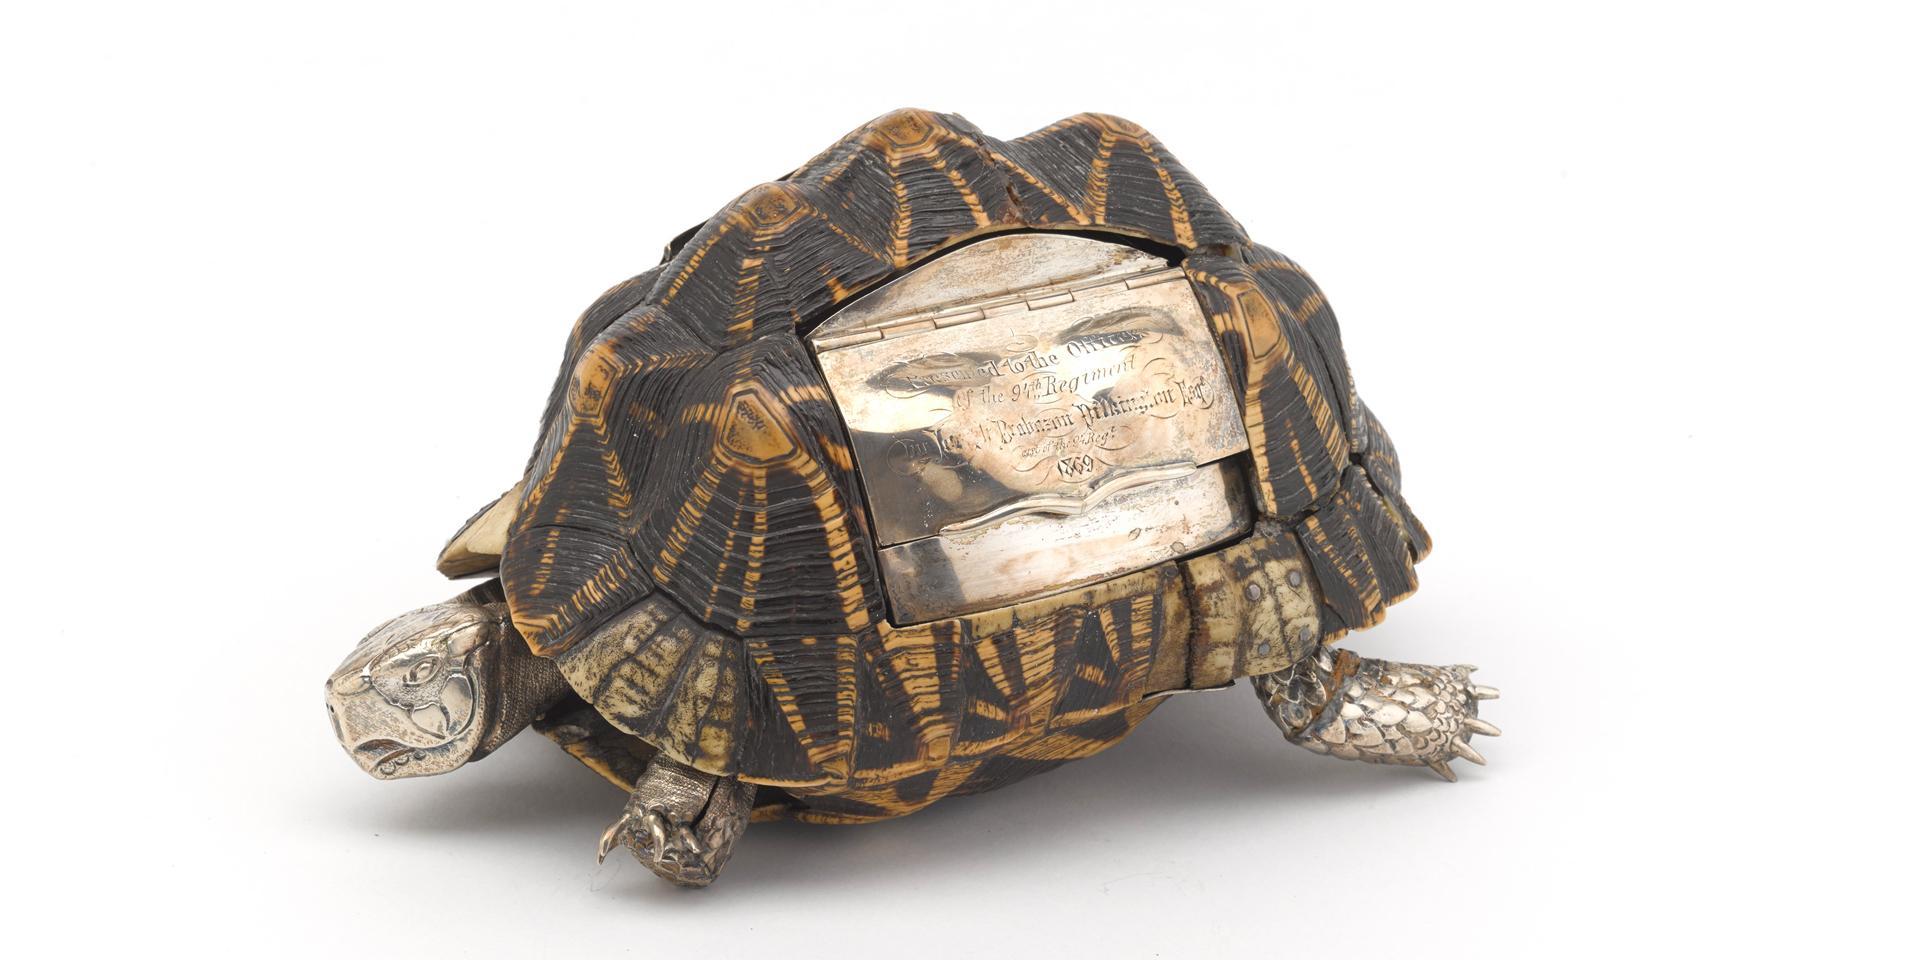 Tortoise snuff box belonging to Joseph Brabazon Pilkington